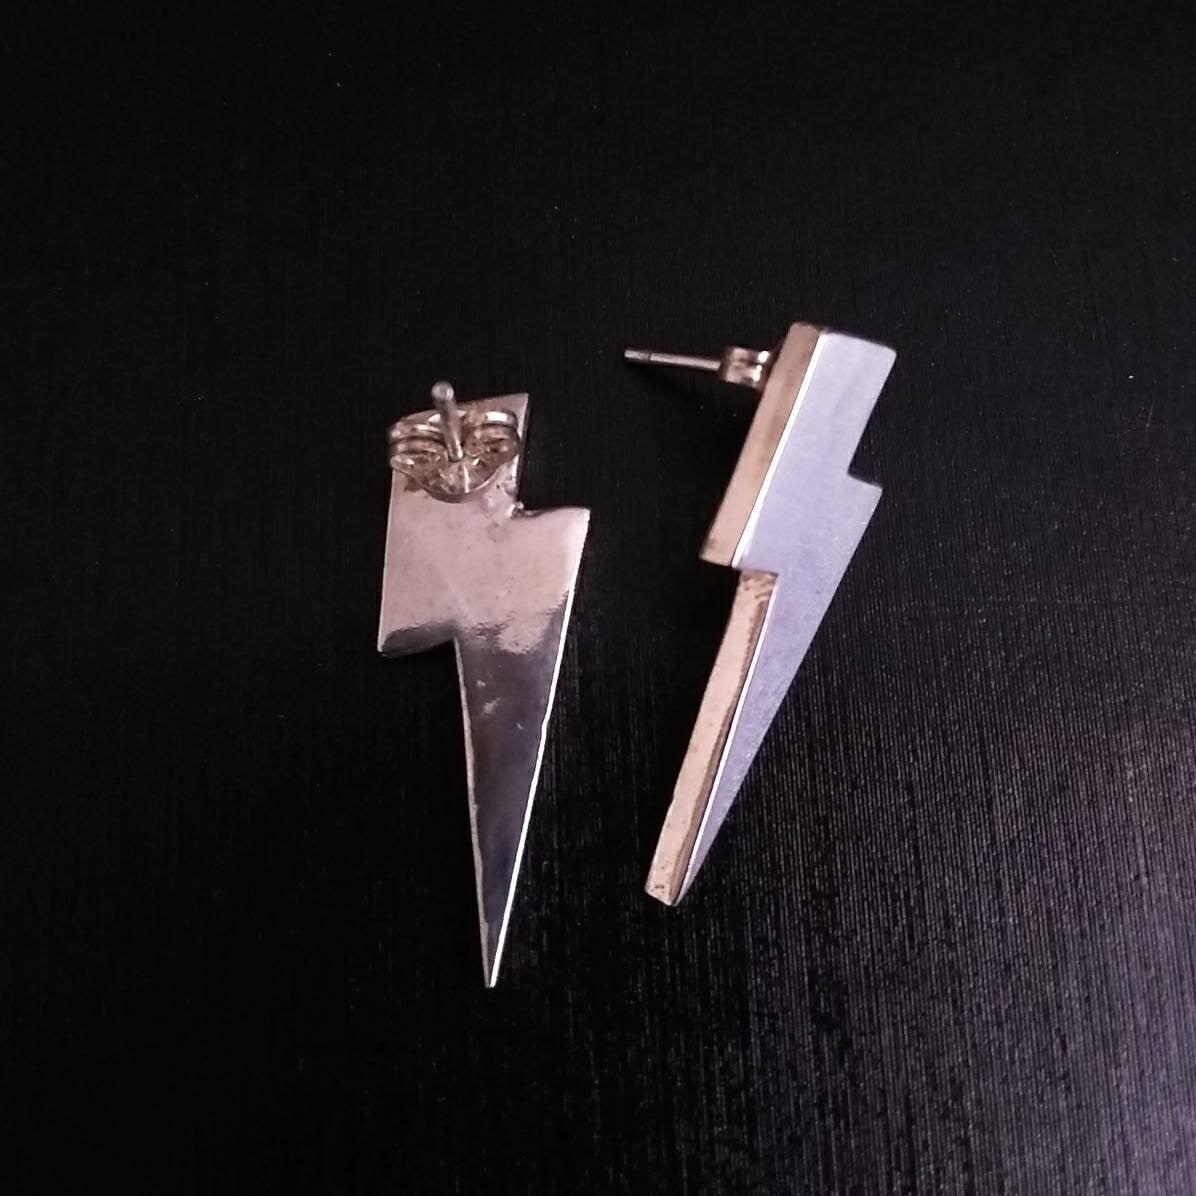 Sterling Silver Lightning Bolt Stud Earrings Lightning Studs 80s Earrings Chunky Stud Earrings Edgy Superhero Glam Rock Power Metal Carol Phillips Art Online Store Powered By Storenvy